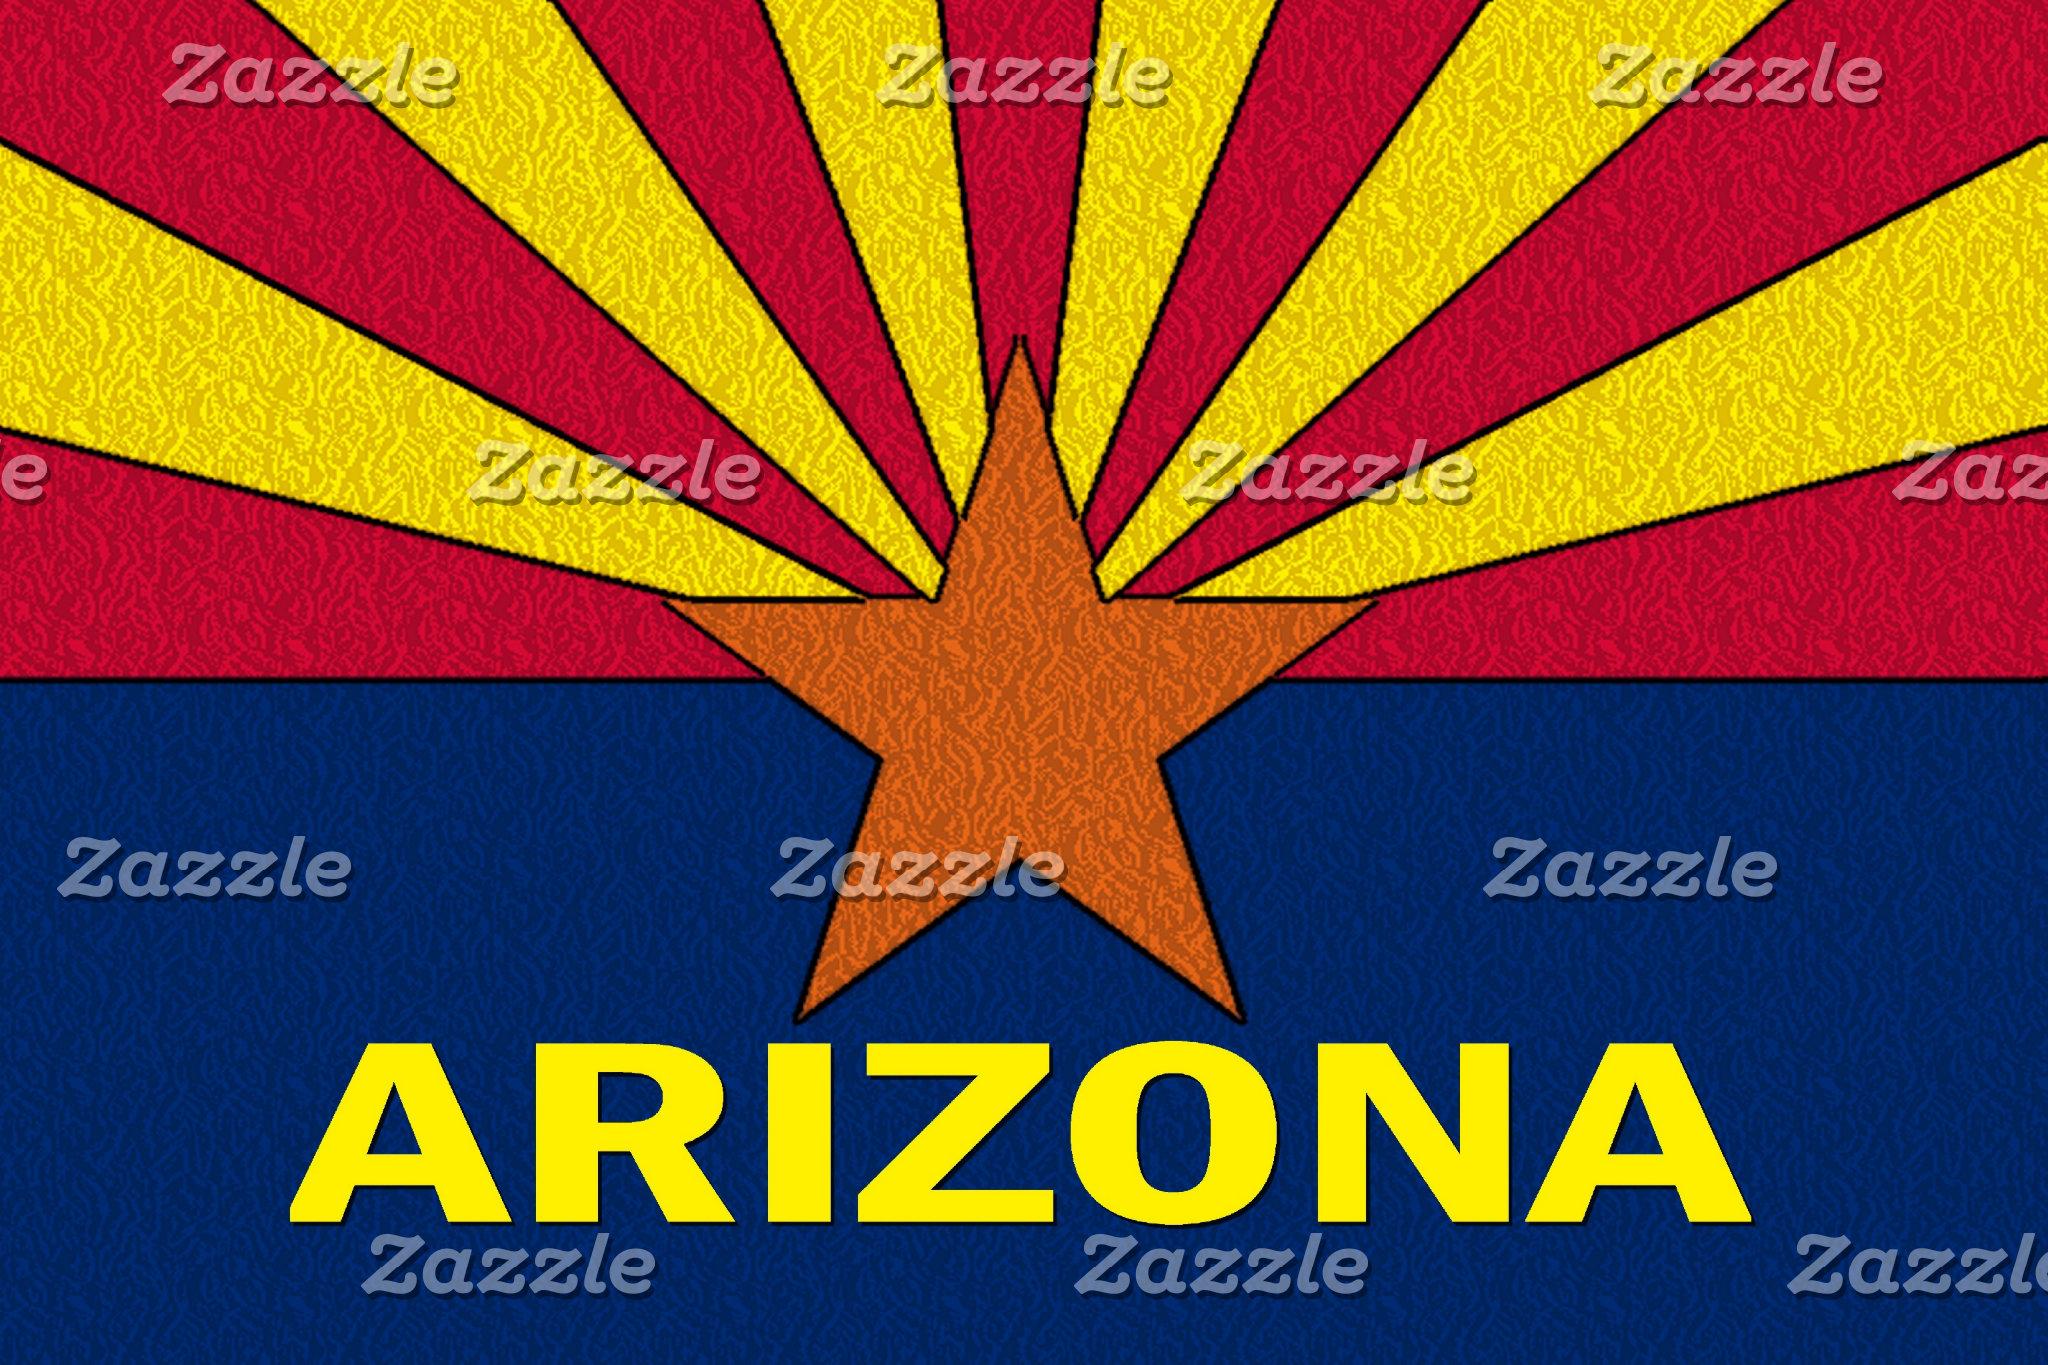 ARIZONA-THE GRAND CANYON STATE